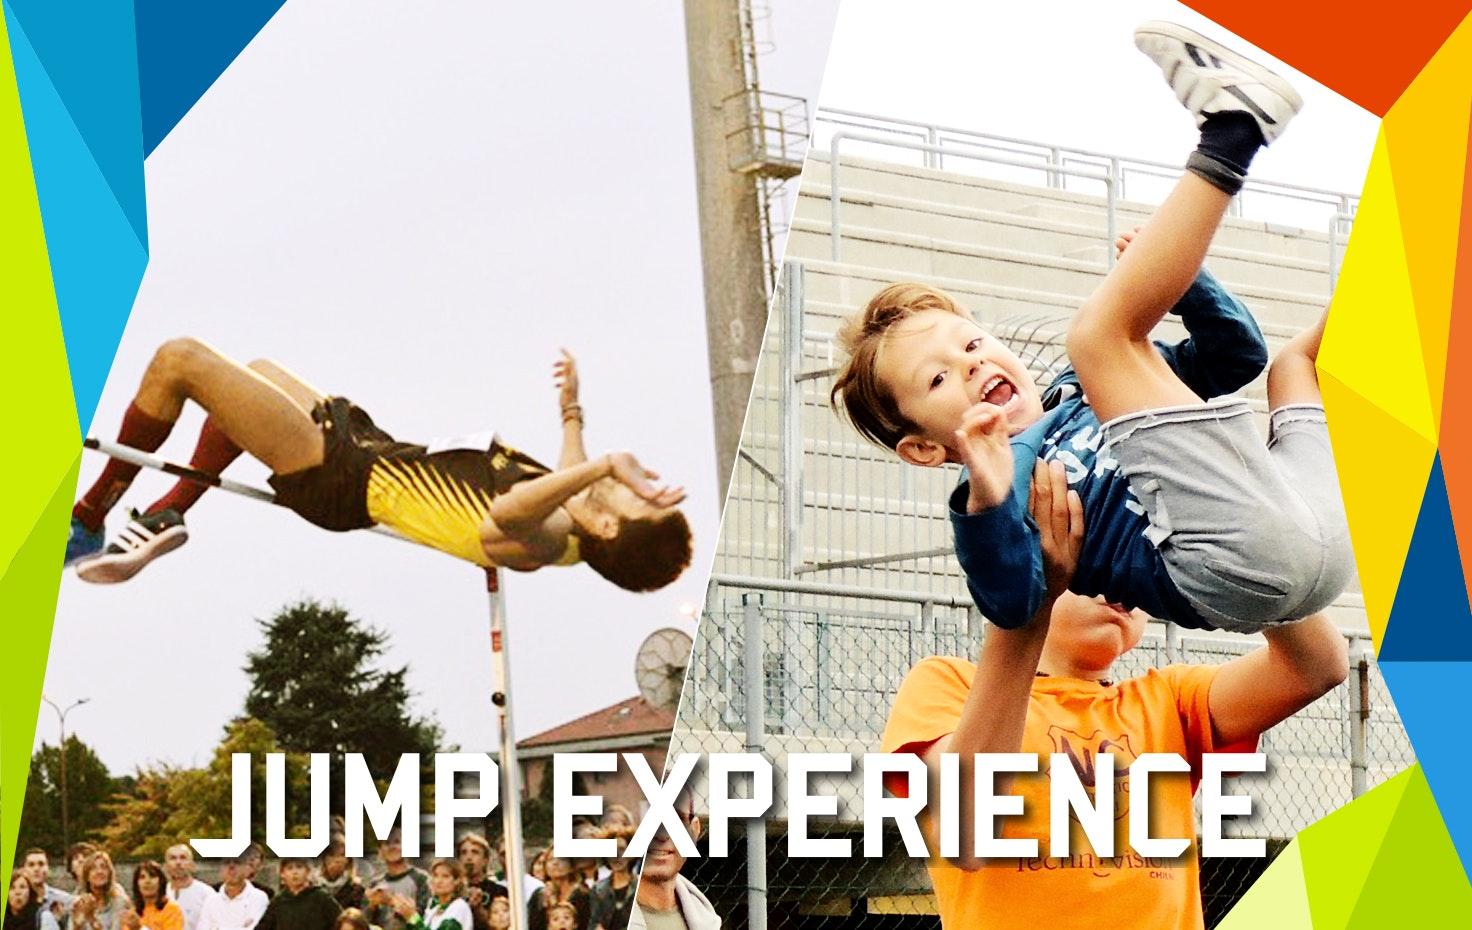 JUMP EXPERIENCE